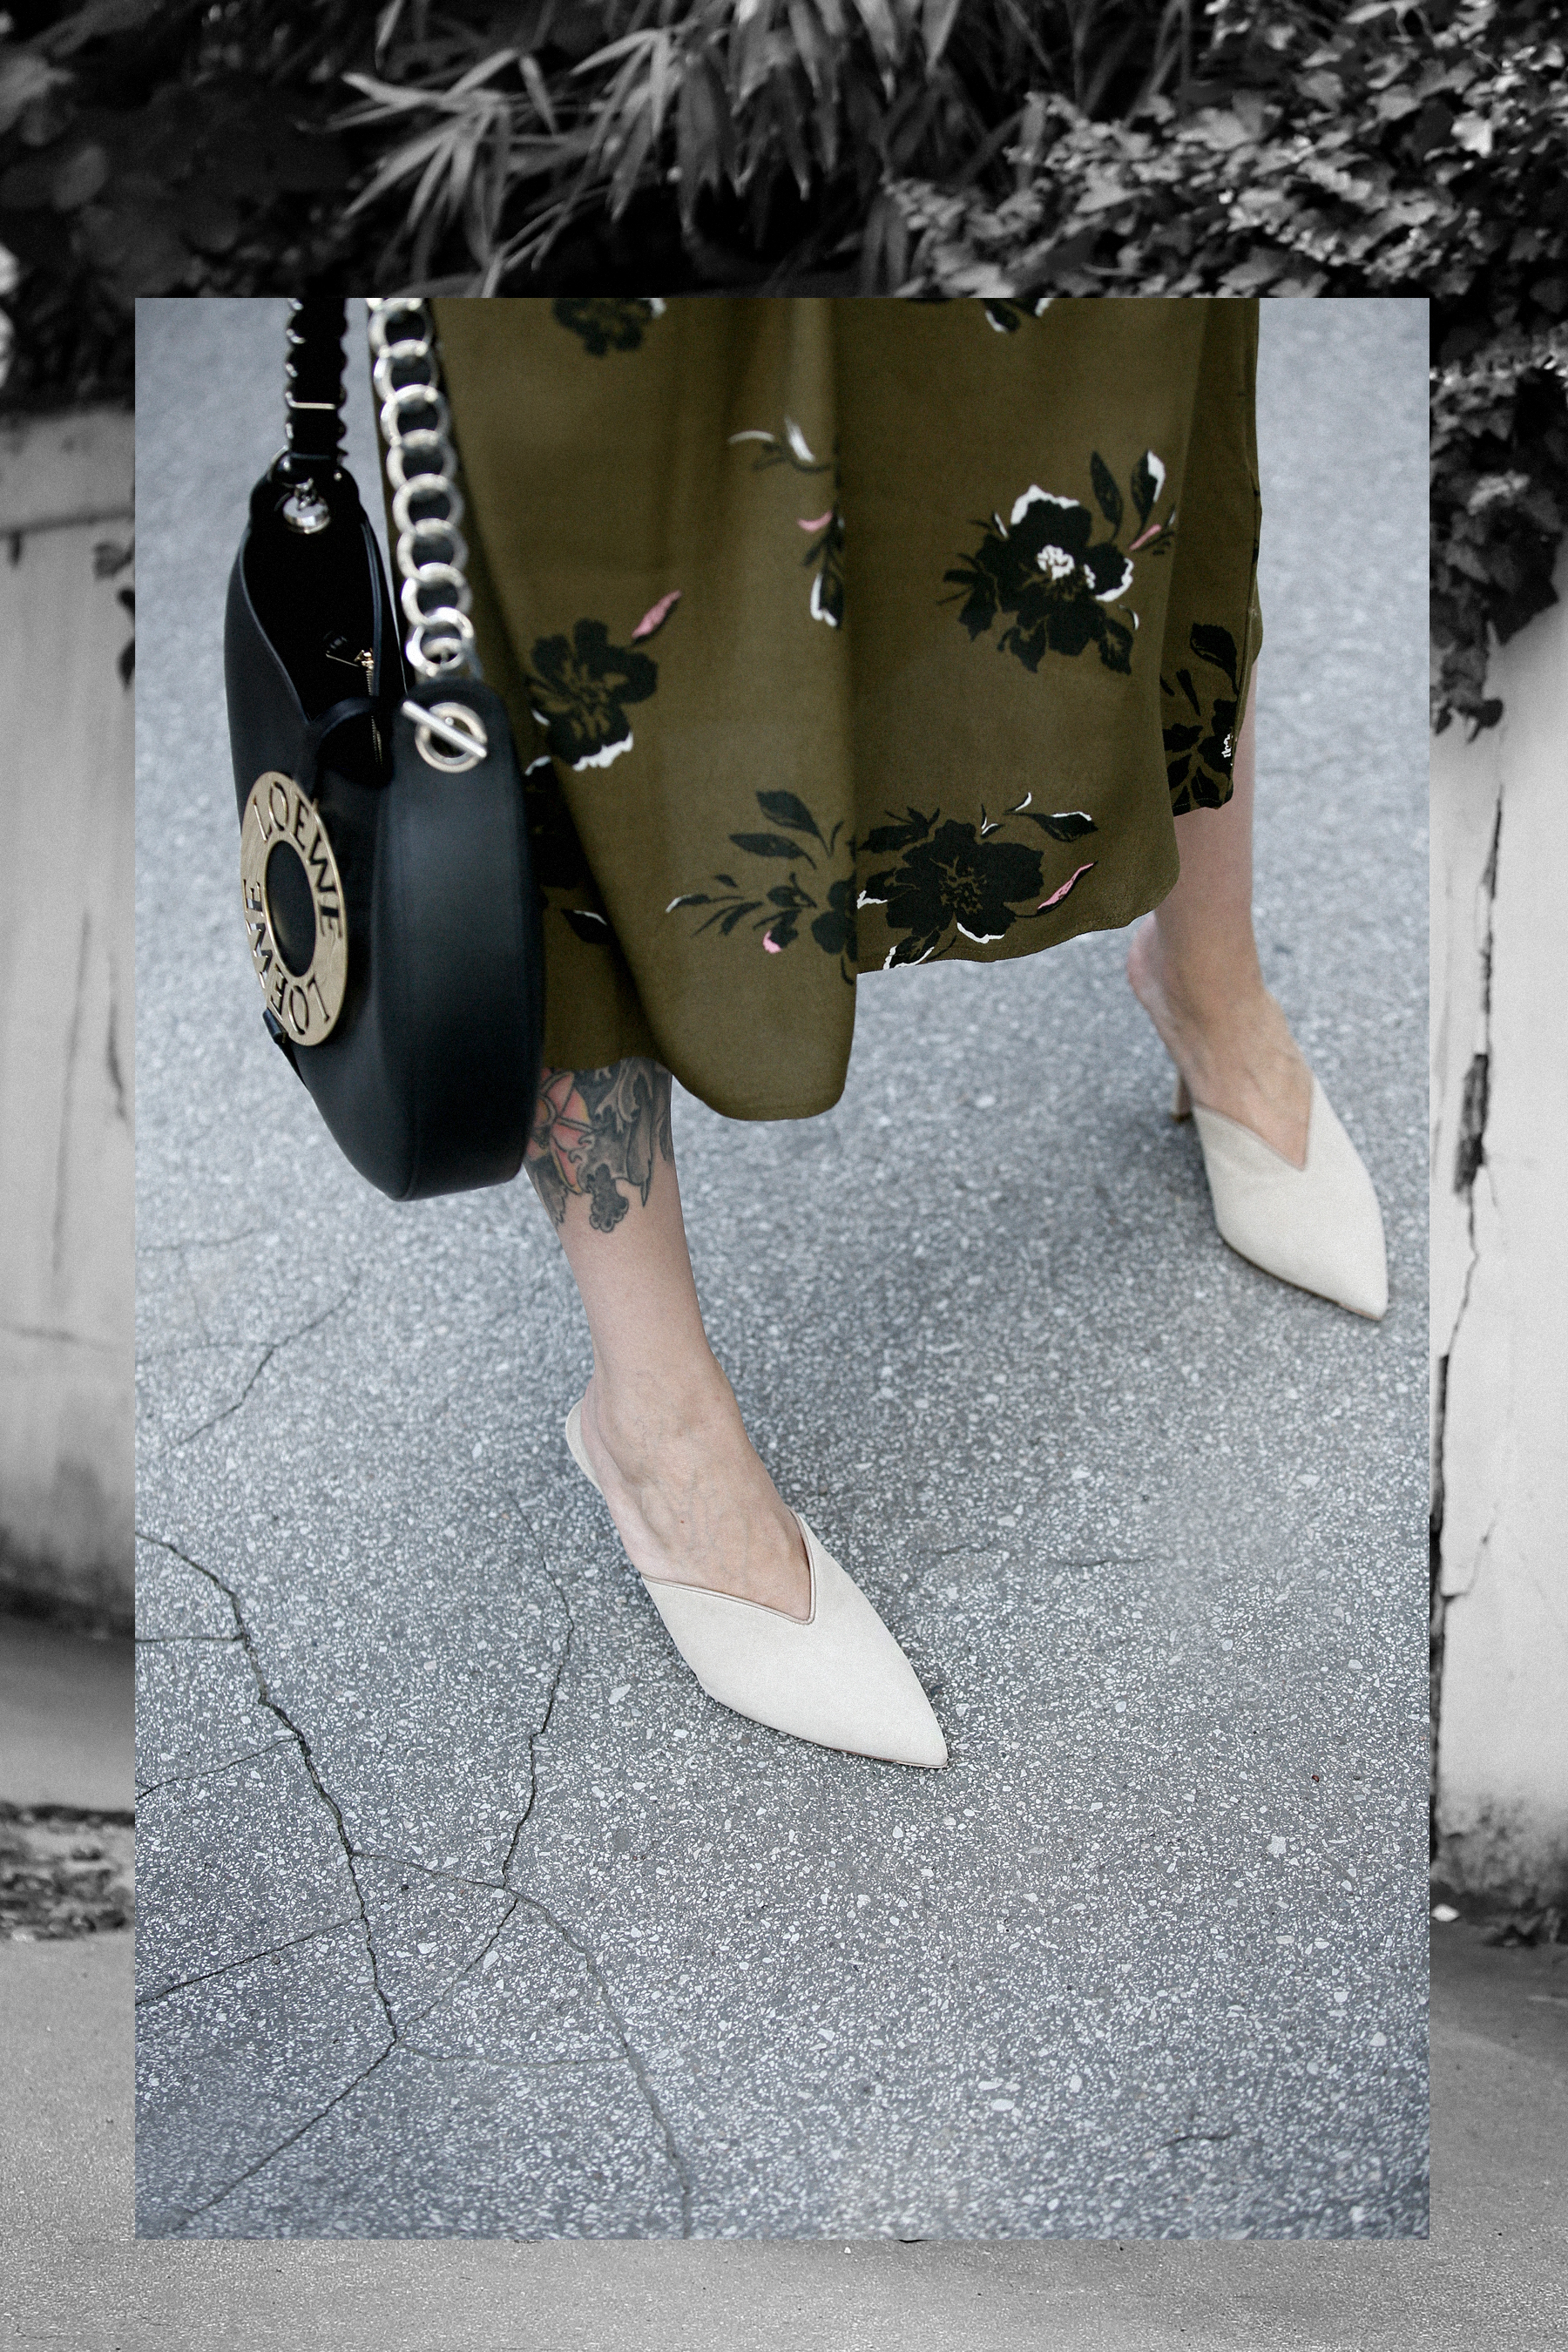 outfit JAKE*S khaki green floral dress LOWE Joyce bag Breuninger Düsseldorf Prada mules Kate Spade New York bracelet first autumn vibes outfit outfitblogger ootd lookbook cats & dogs modeblog ricarda schernus max bechmann styleblogger fotografie film 1